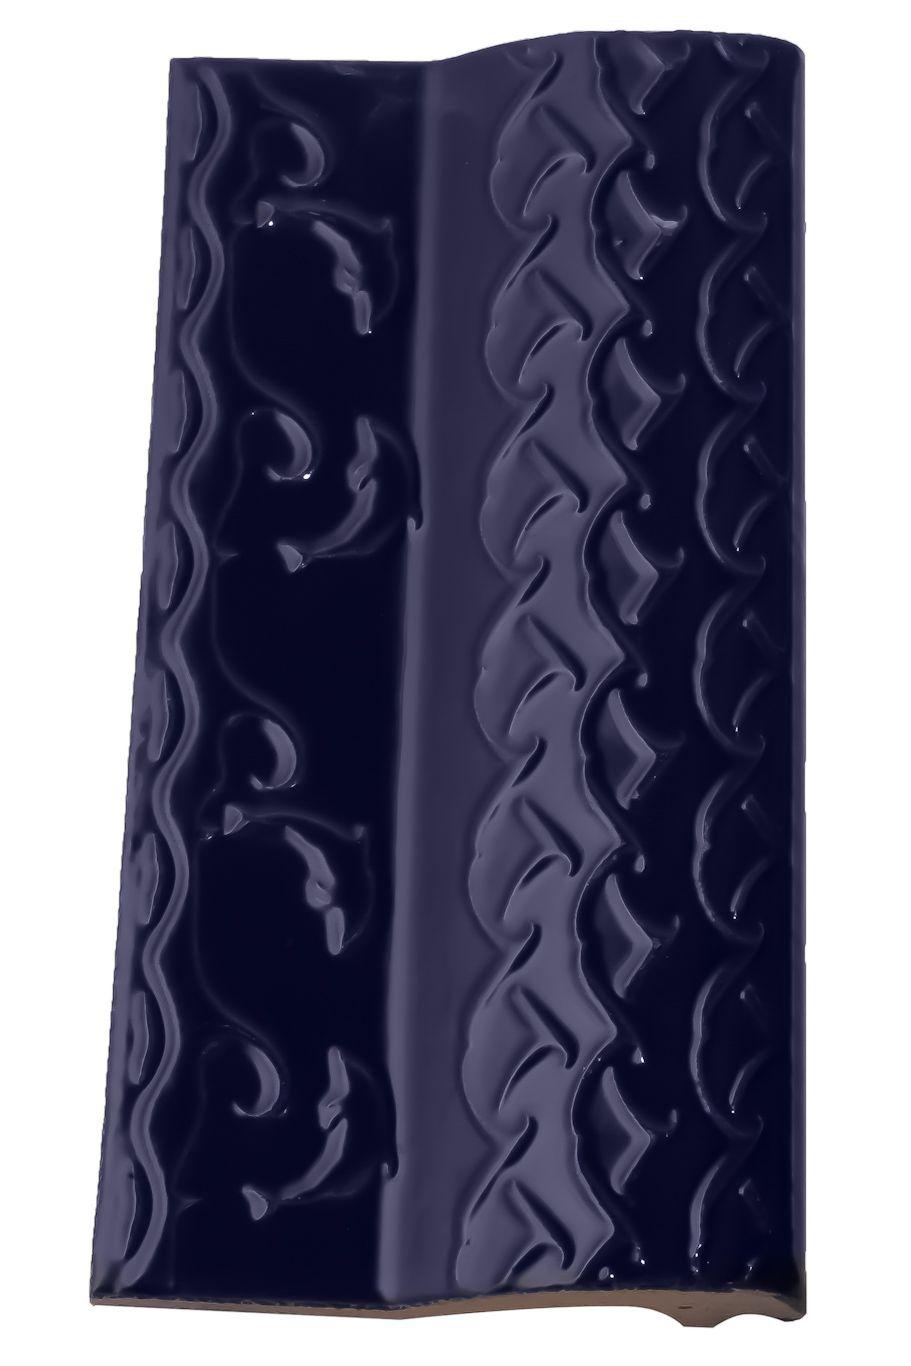 Borda de Piscina 12x25 de Vinil e Azulejo - 16 Modelos